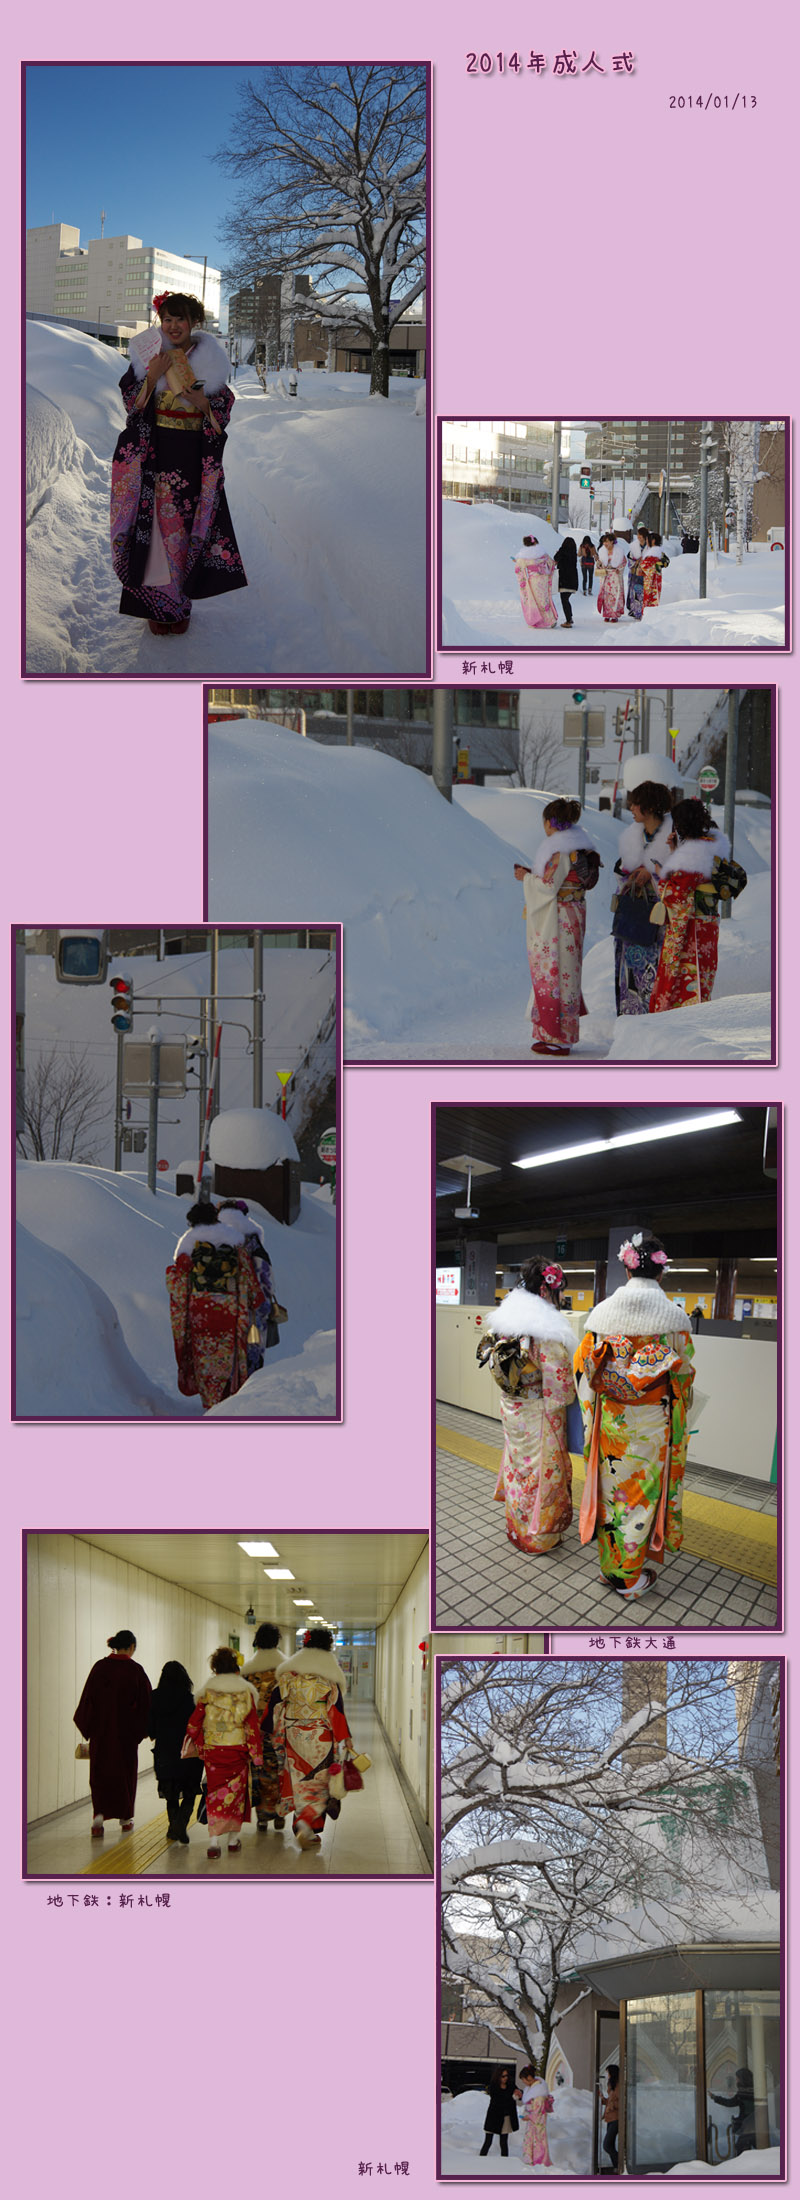 吹雪の中の写真展&成人式_b0019313_1881719.jpg